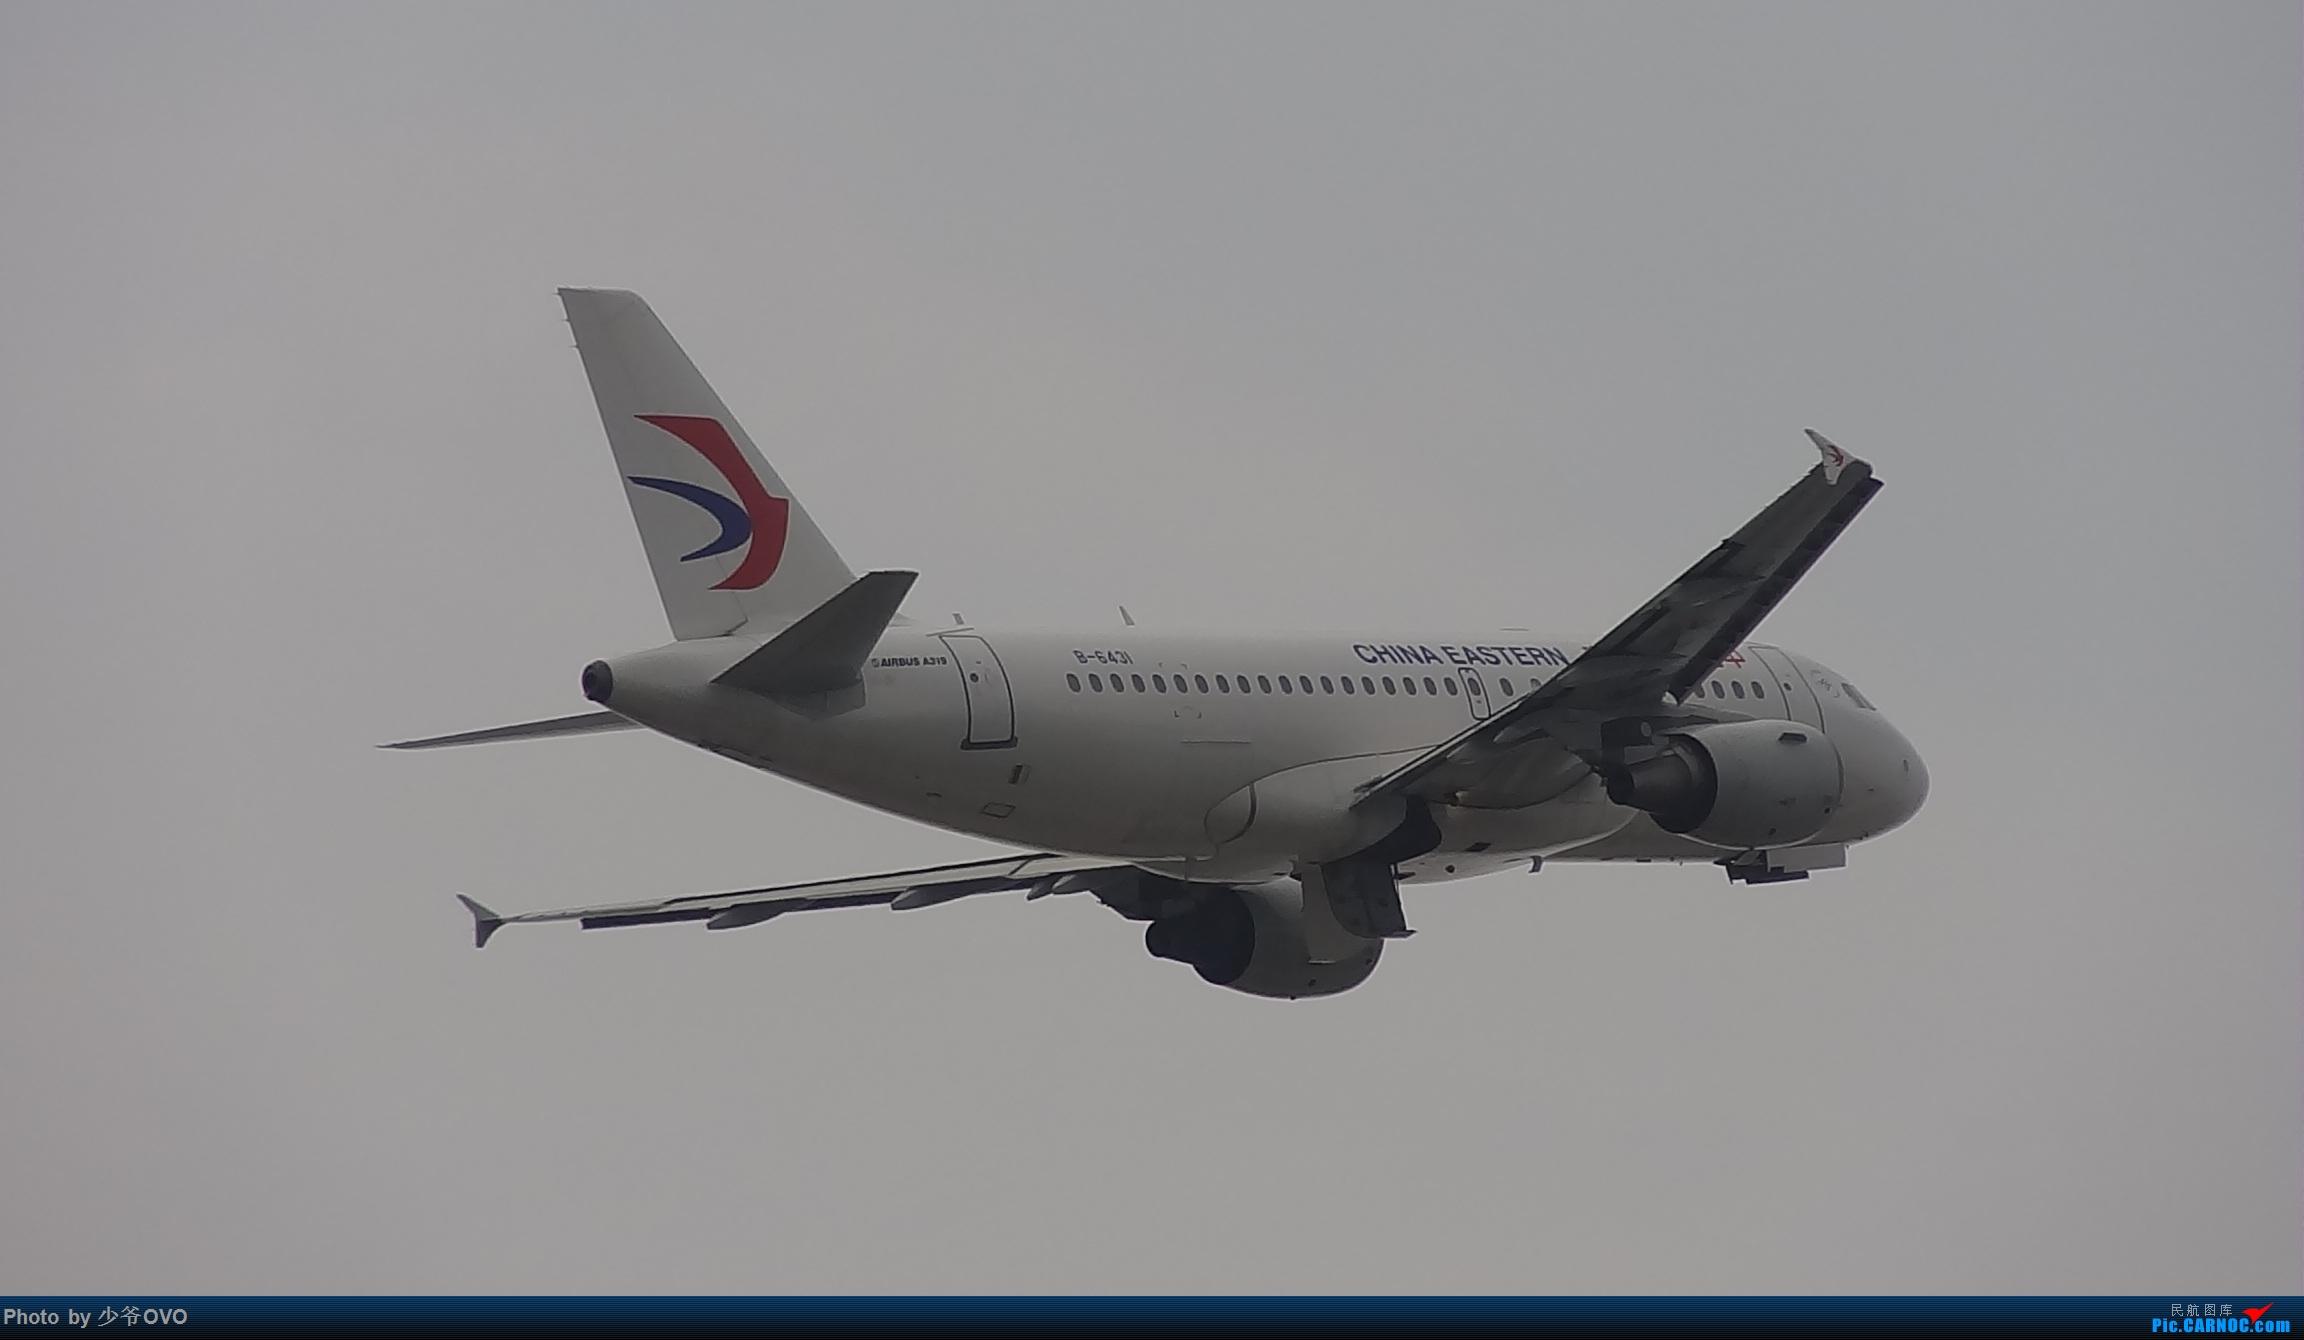 Re:[原创]CKG重庆江北机场拍机,国航744,B-2447,和一群大佬拍机 AIRBUS A319-100 B-6431 中国重庆江北国际机场